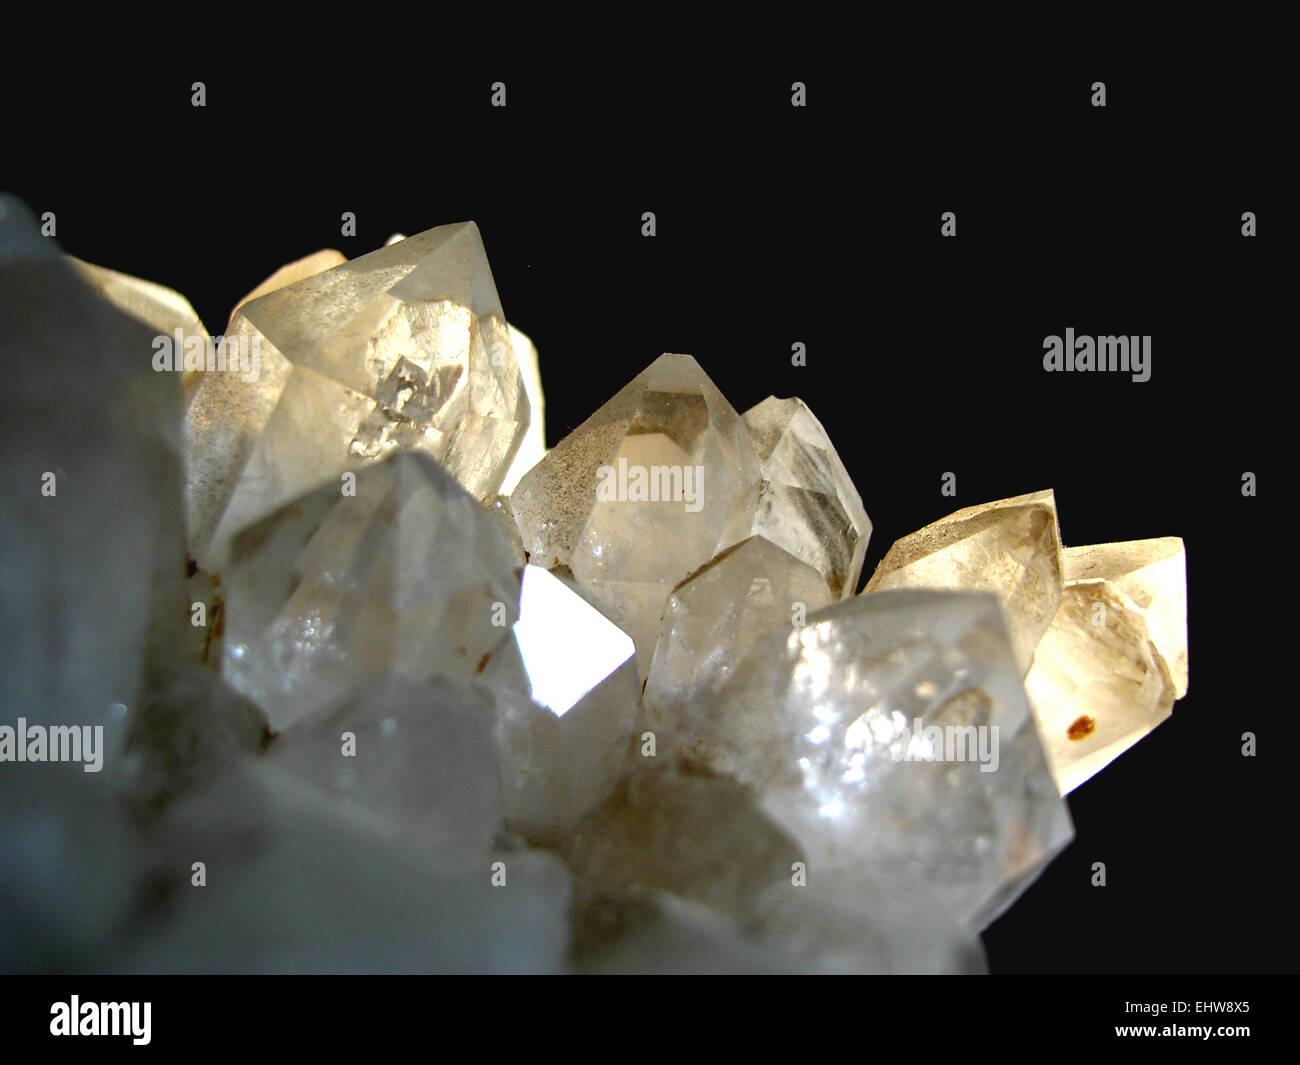 Quartz crystal - Stock Image